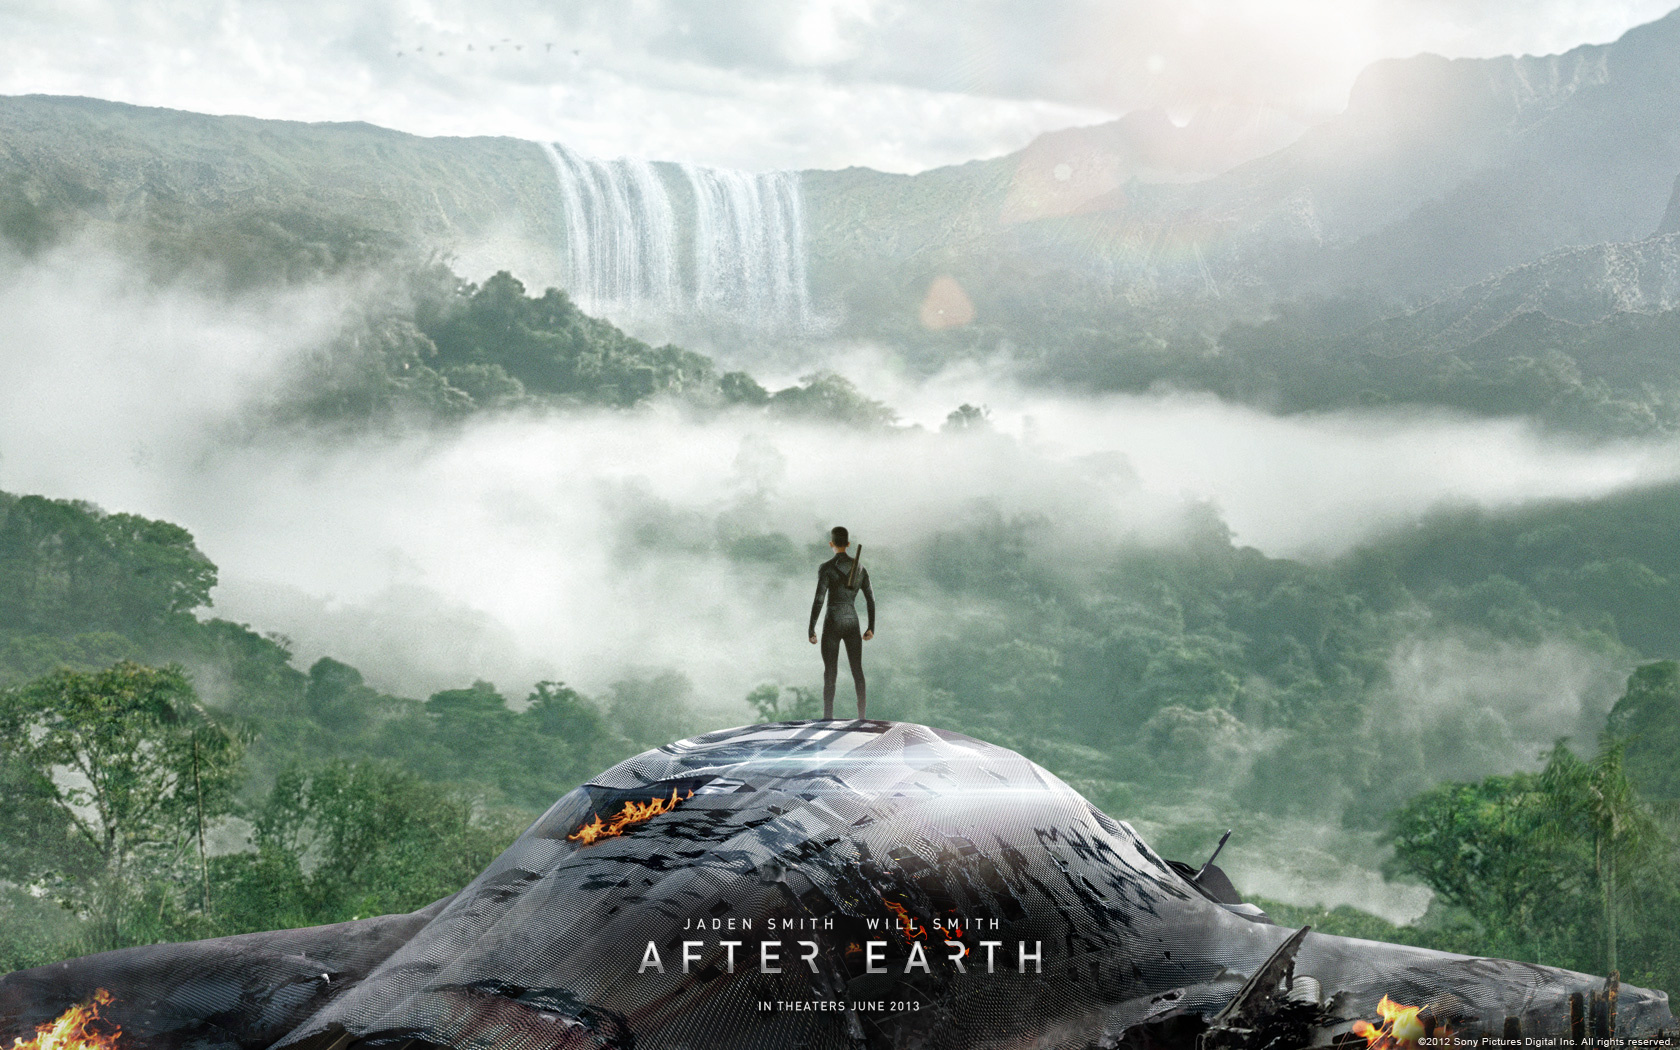 After Earth 2013 Wallpaper HD Download ImageBankbiz 1680x1050